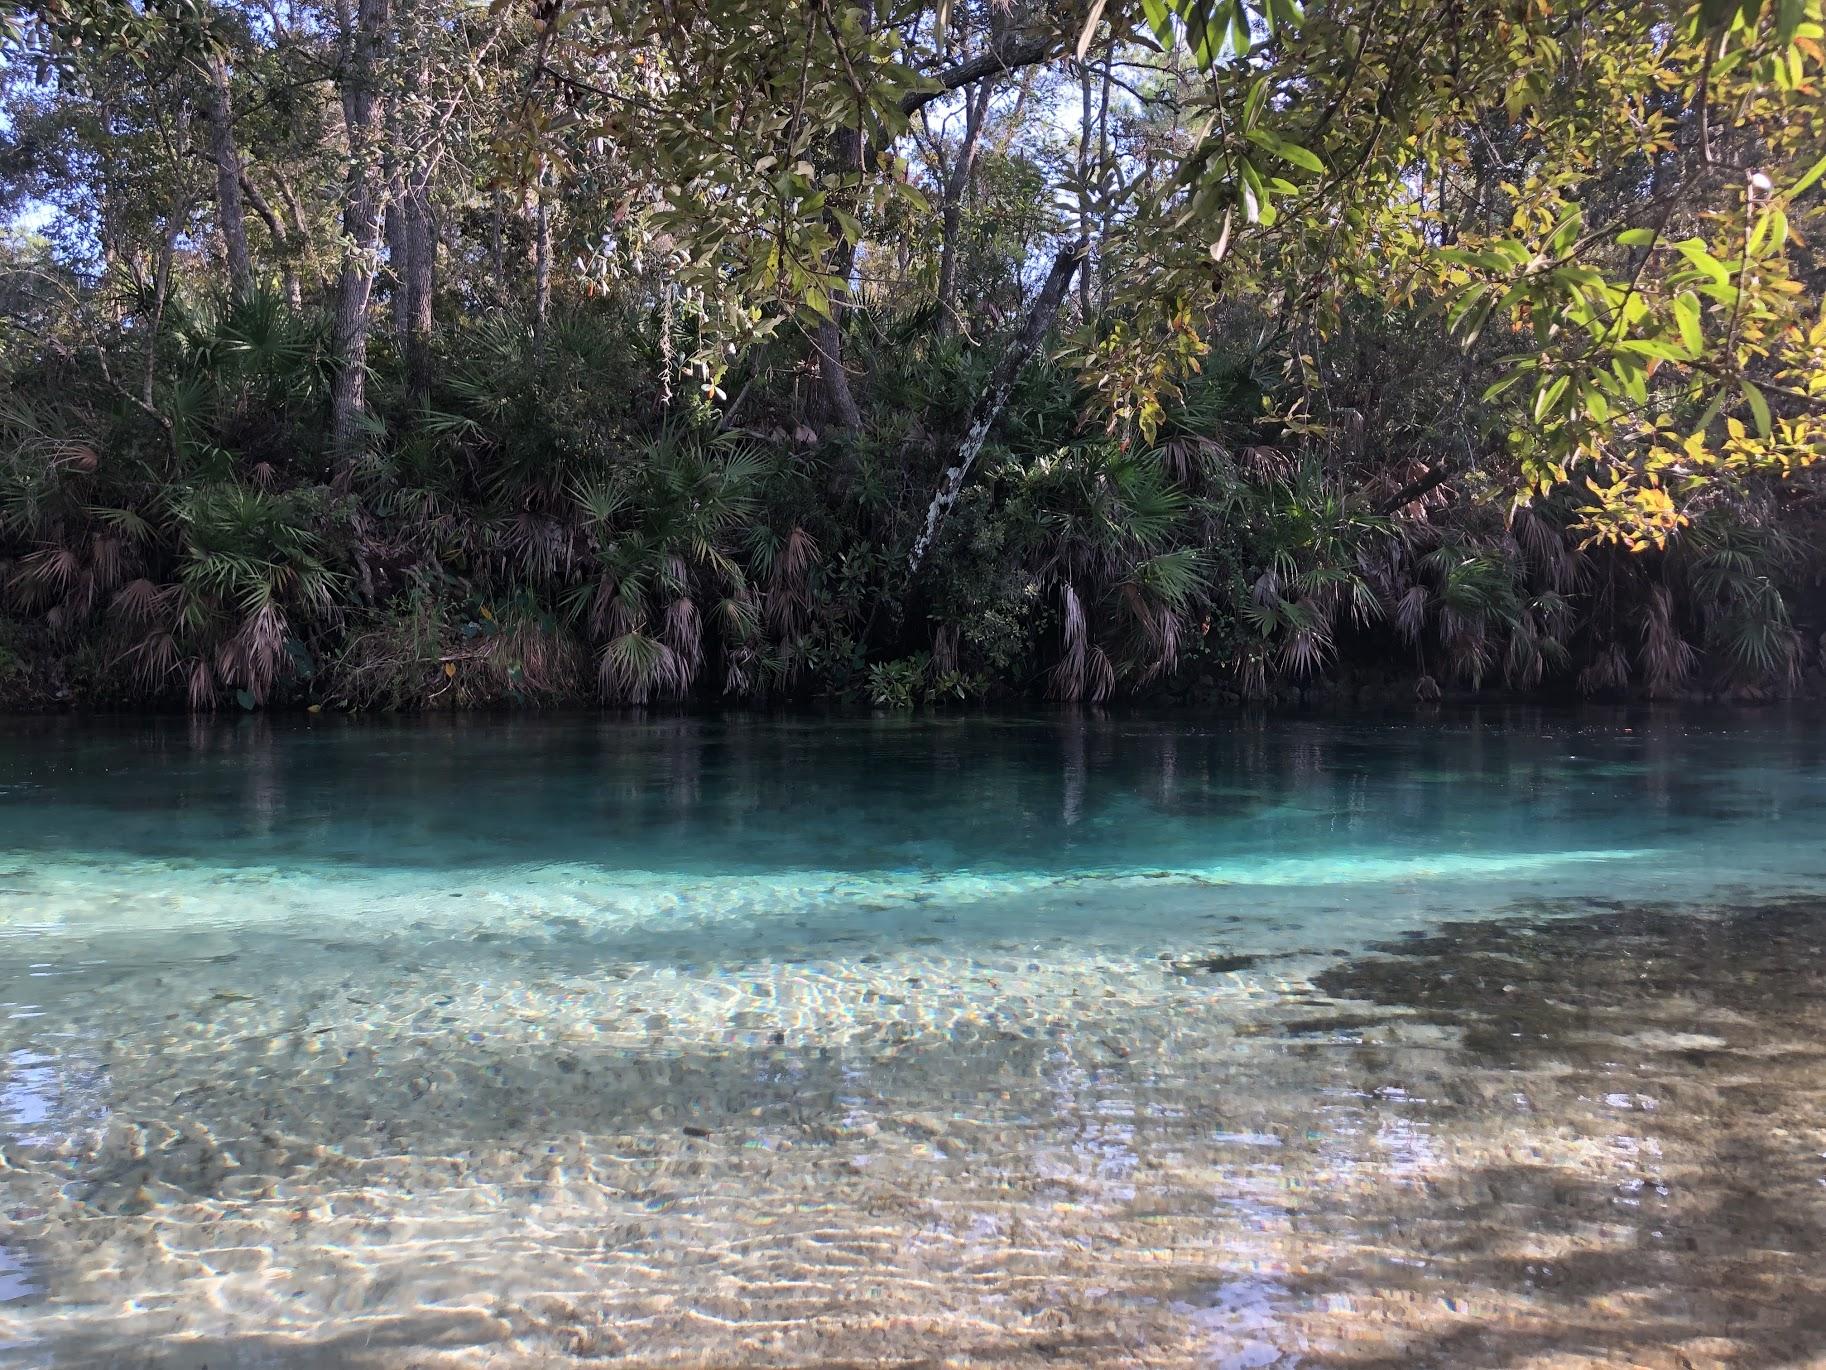 Crystal clear waters of Weeki Wachee River